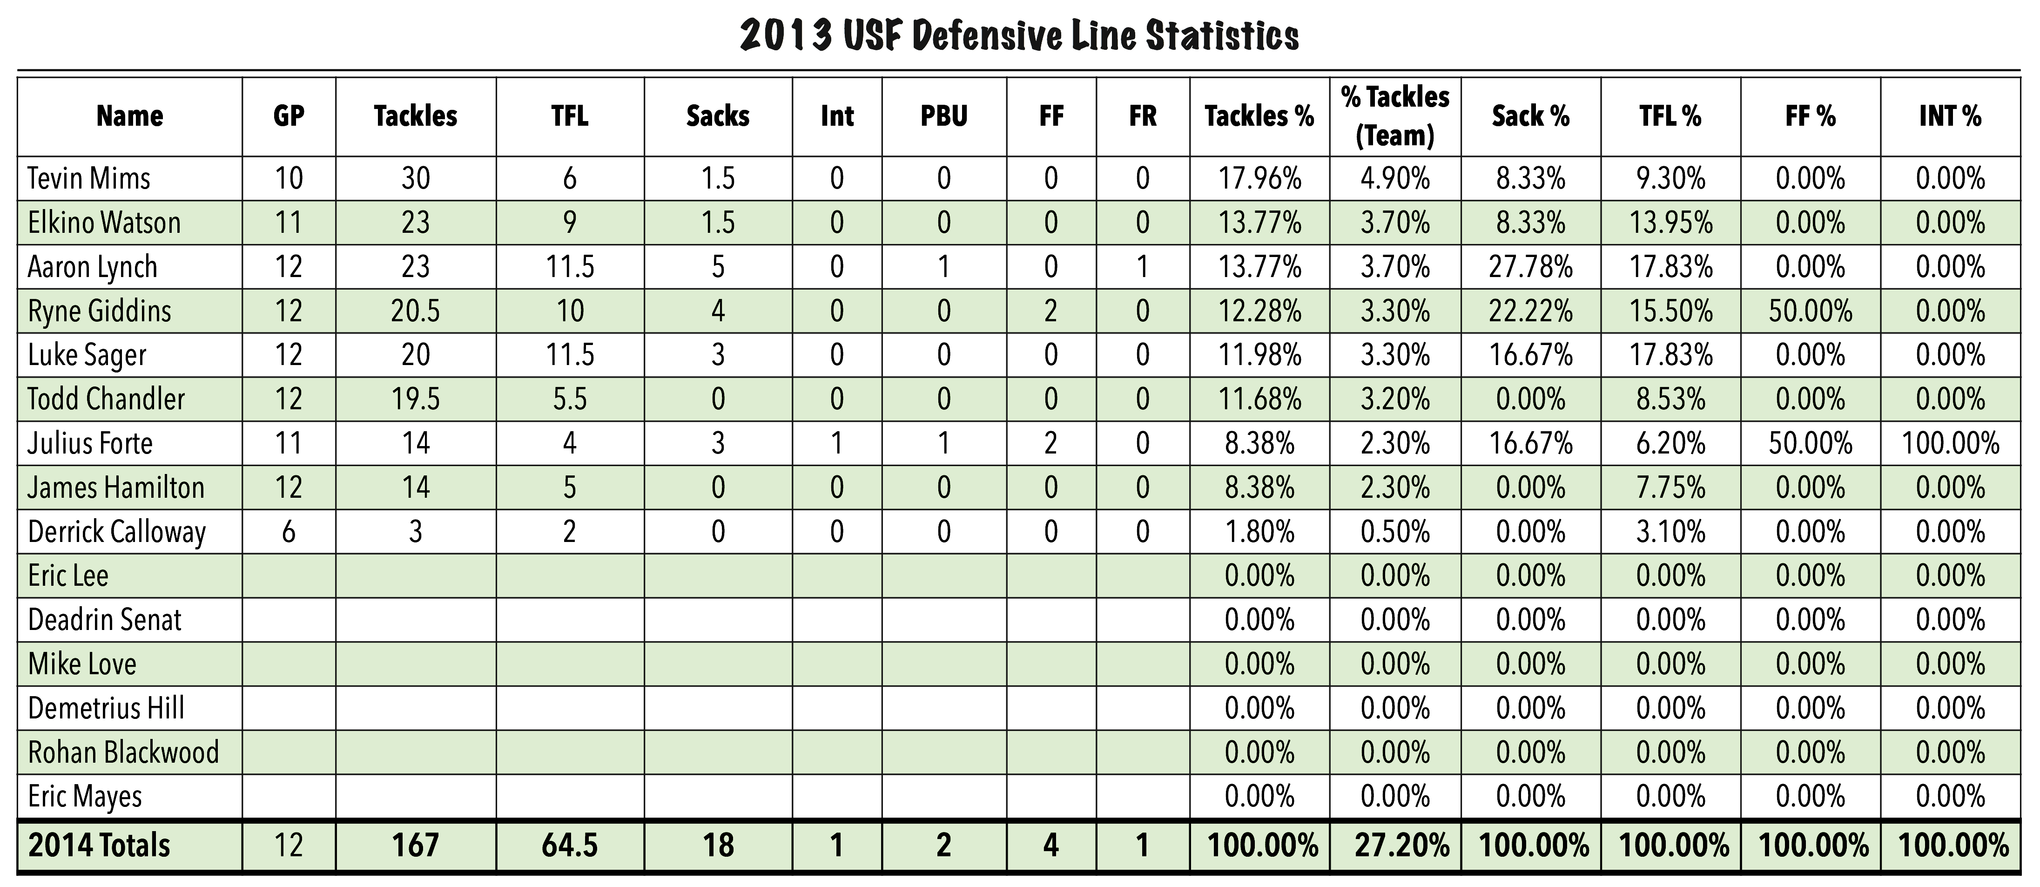 2013_usf_football_defensive_line_statistics_by_matthew_manuri_ii